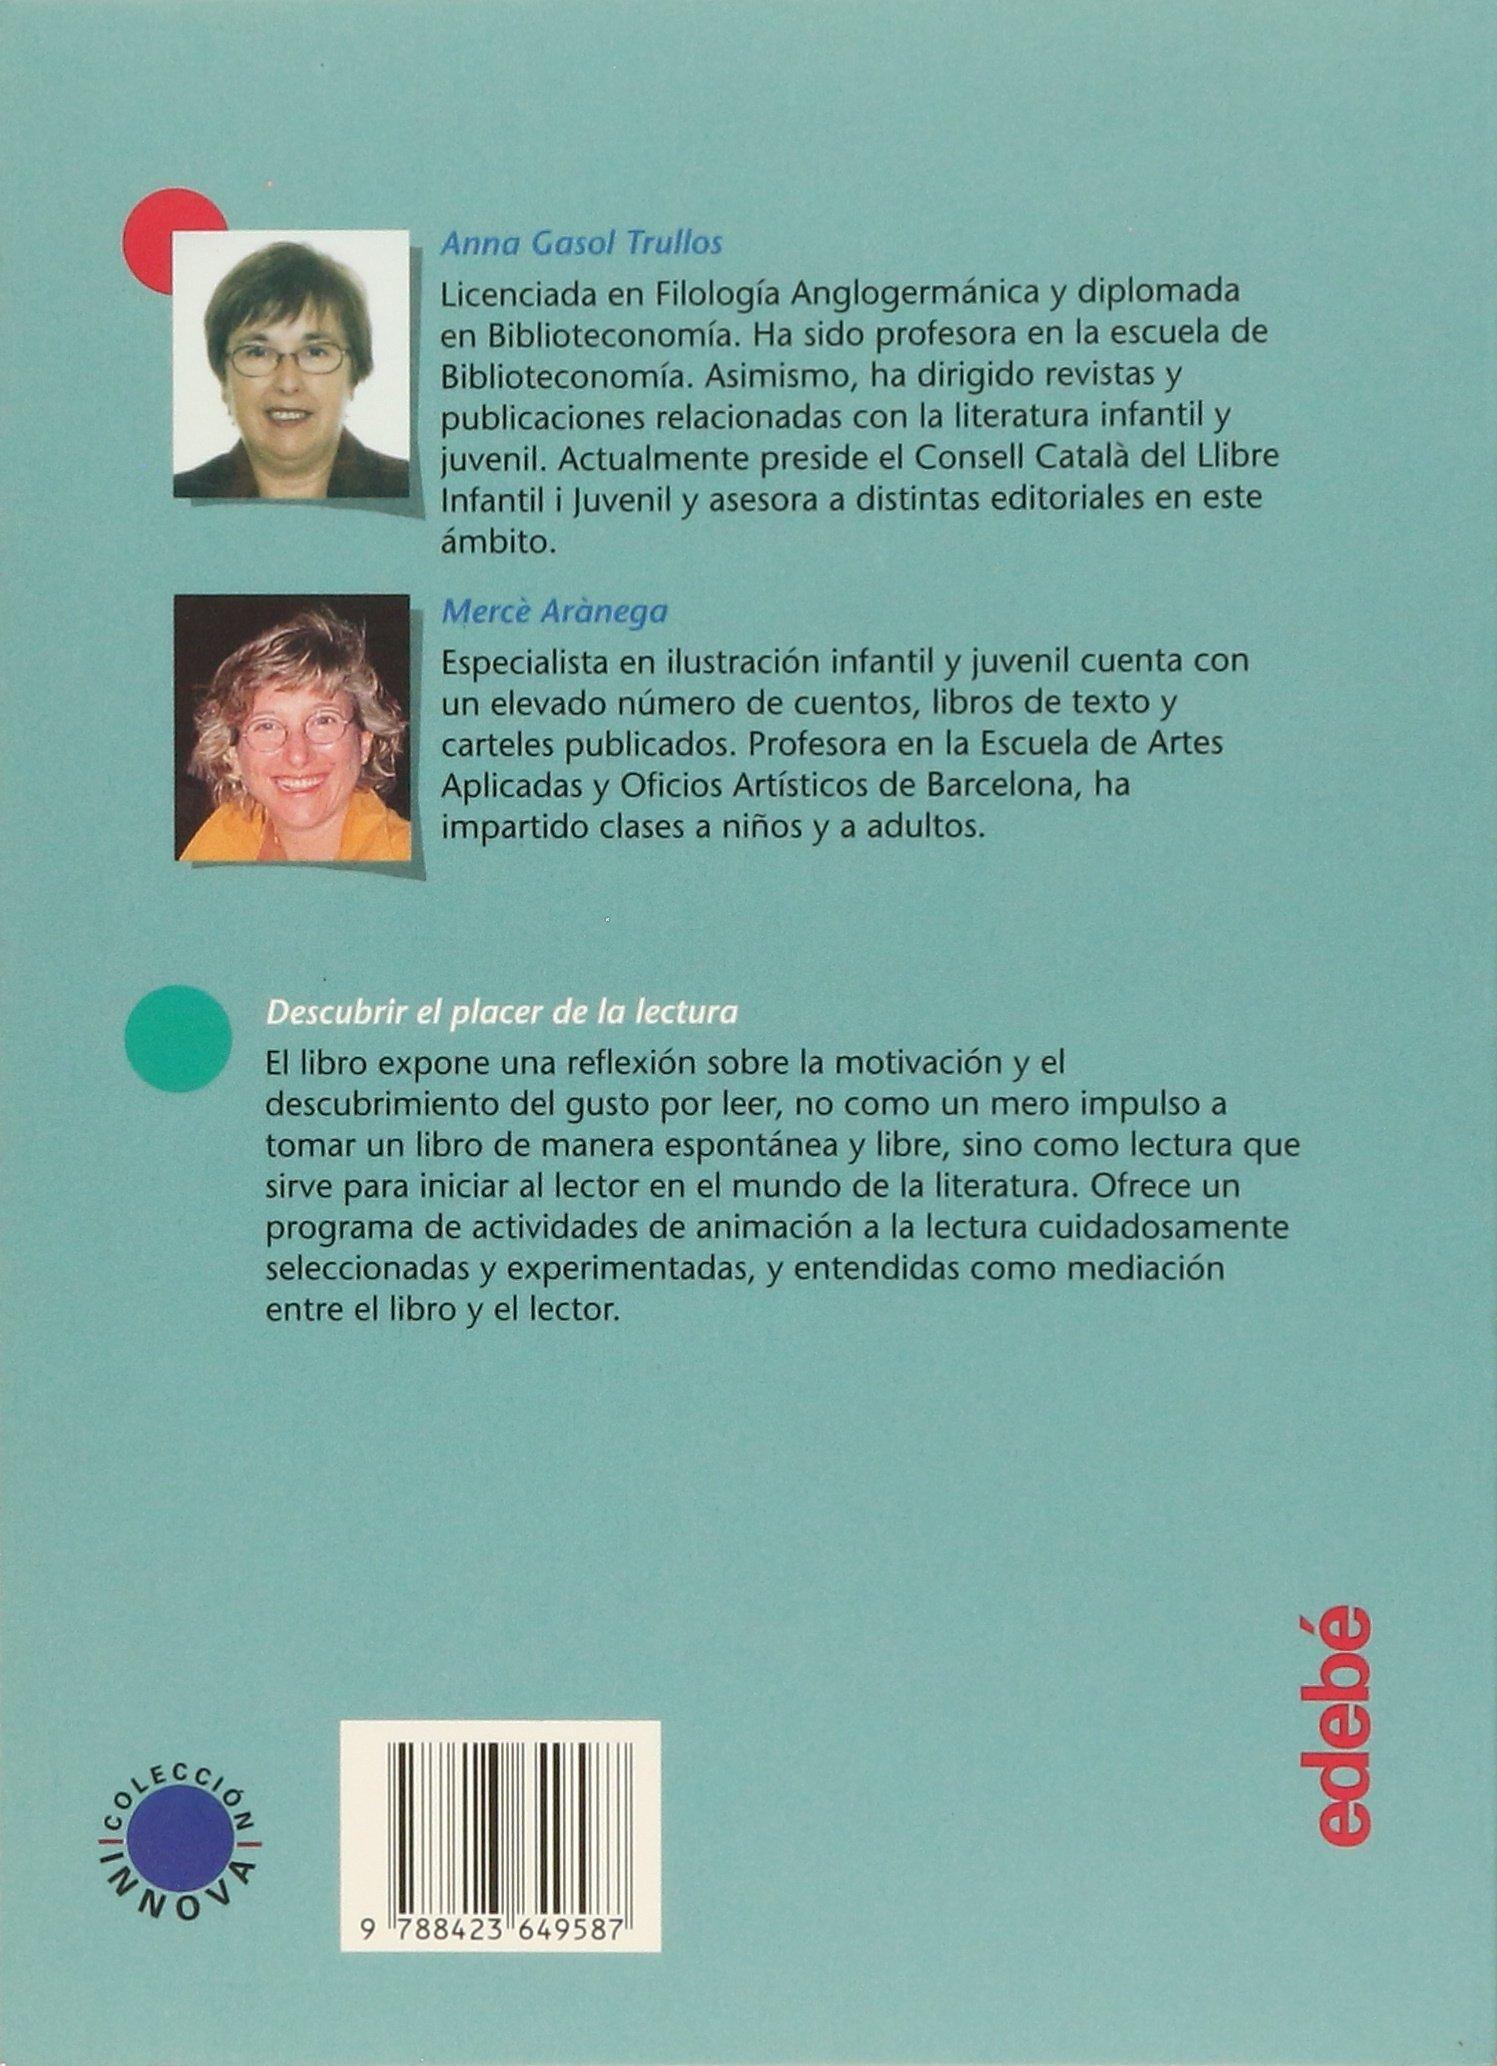 Descubrir el placer de la lectura (Innova): Amazon.es: Anna Gasol, Merce Aranega: Libros